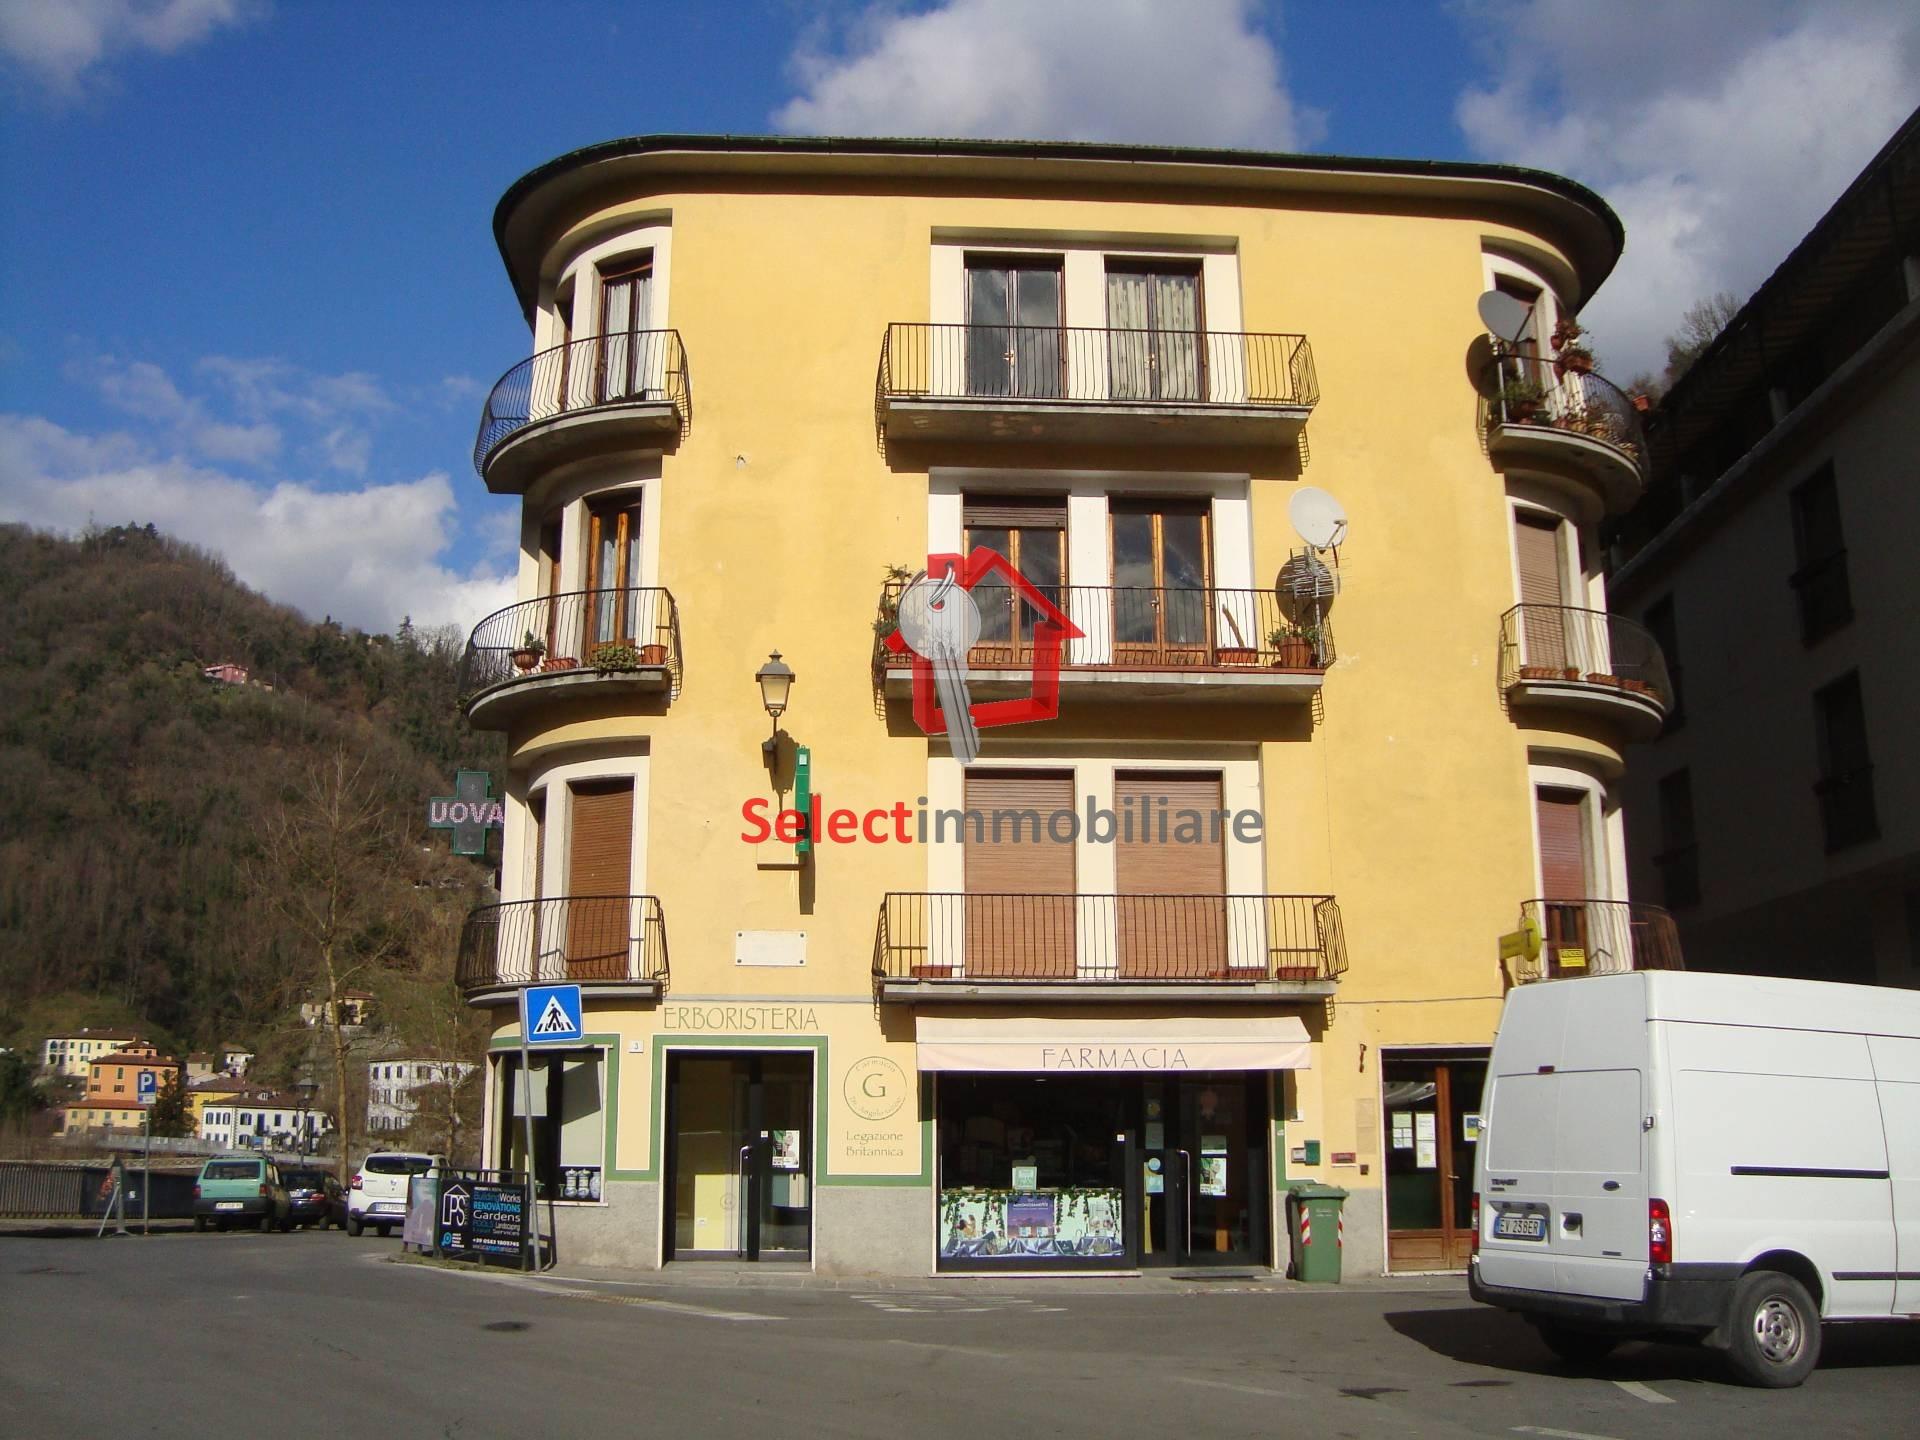 Case e appartamenti in vendita a Bagni di Lucca - Cambiocasa.it